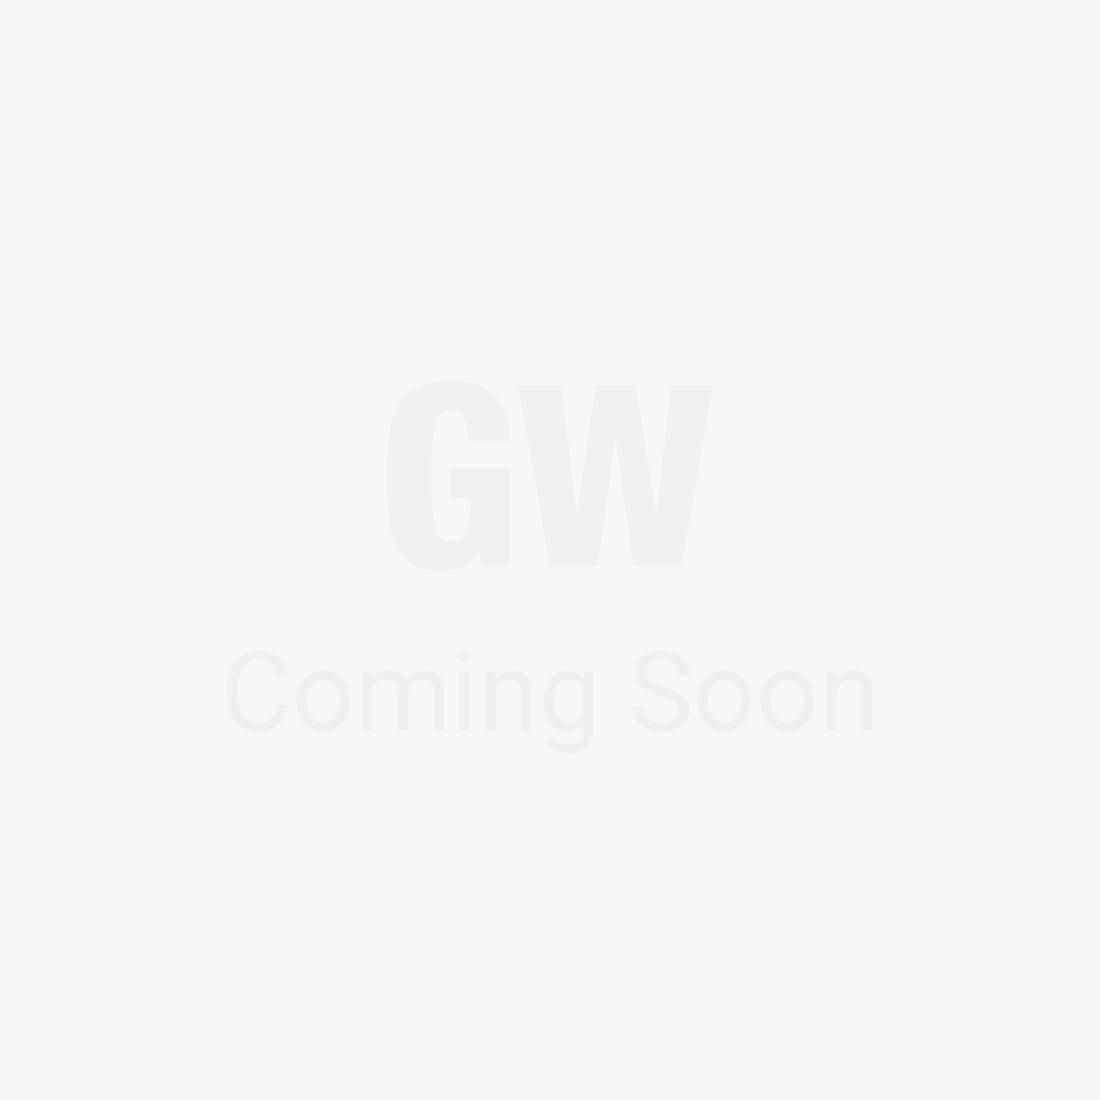 Vittoria Gilbert 2 Seater Lft Arm Large Sofa